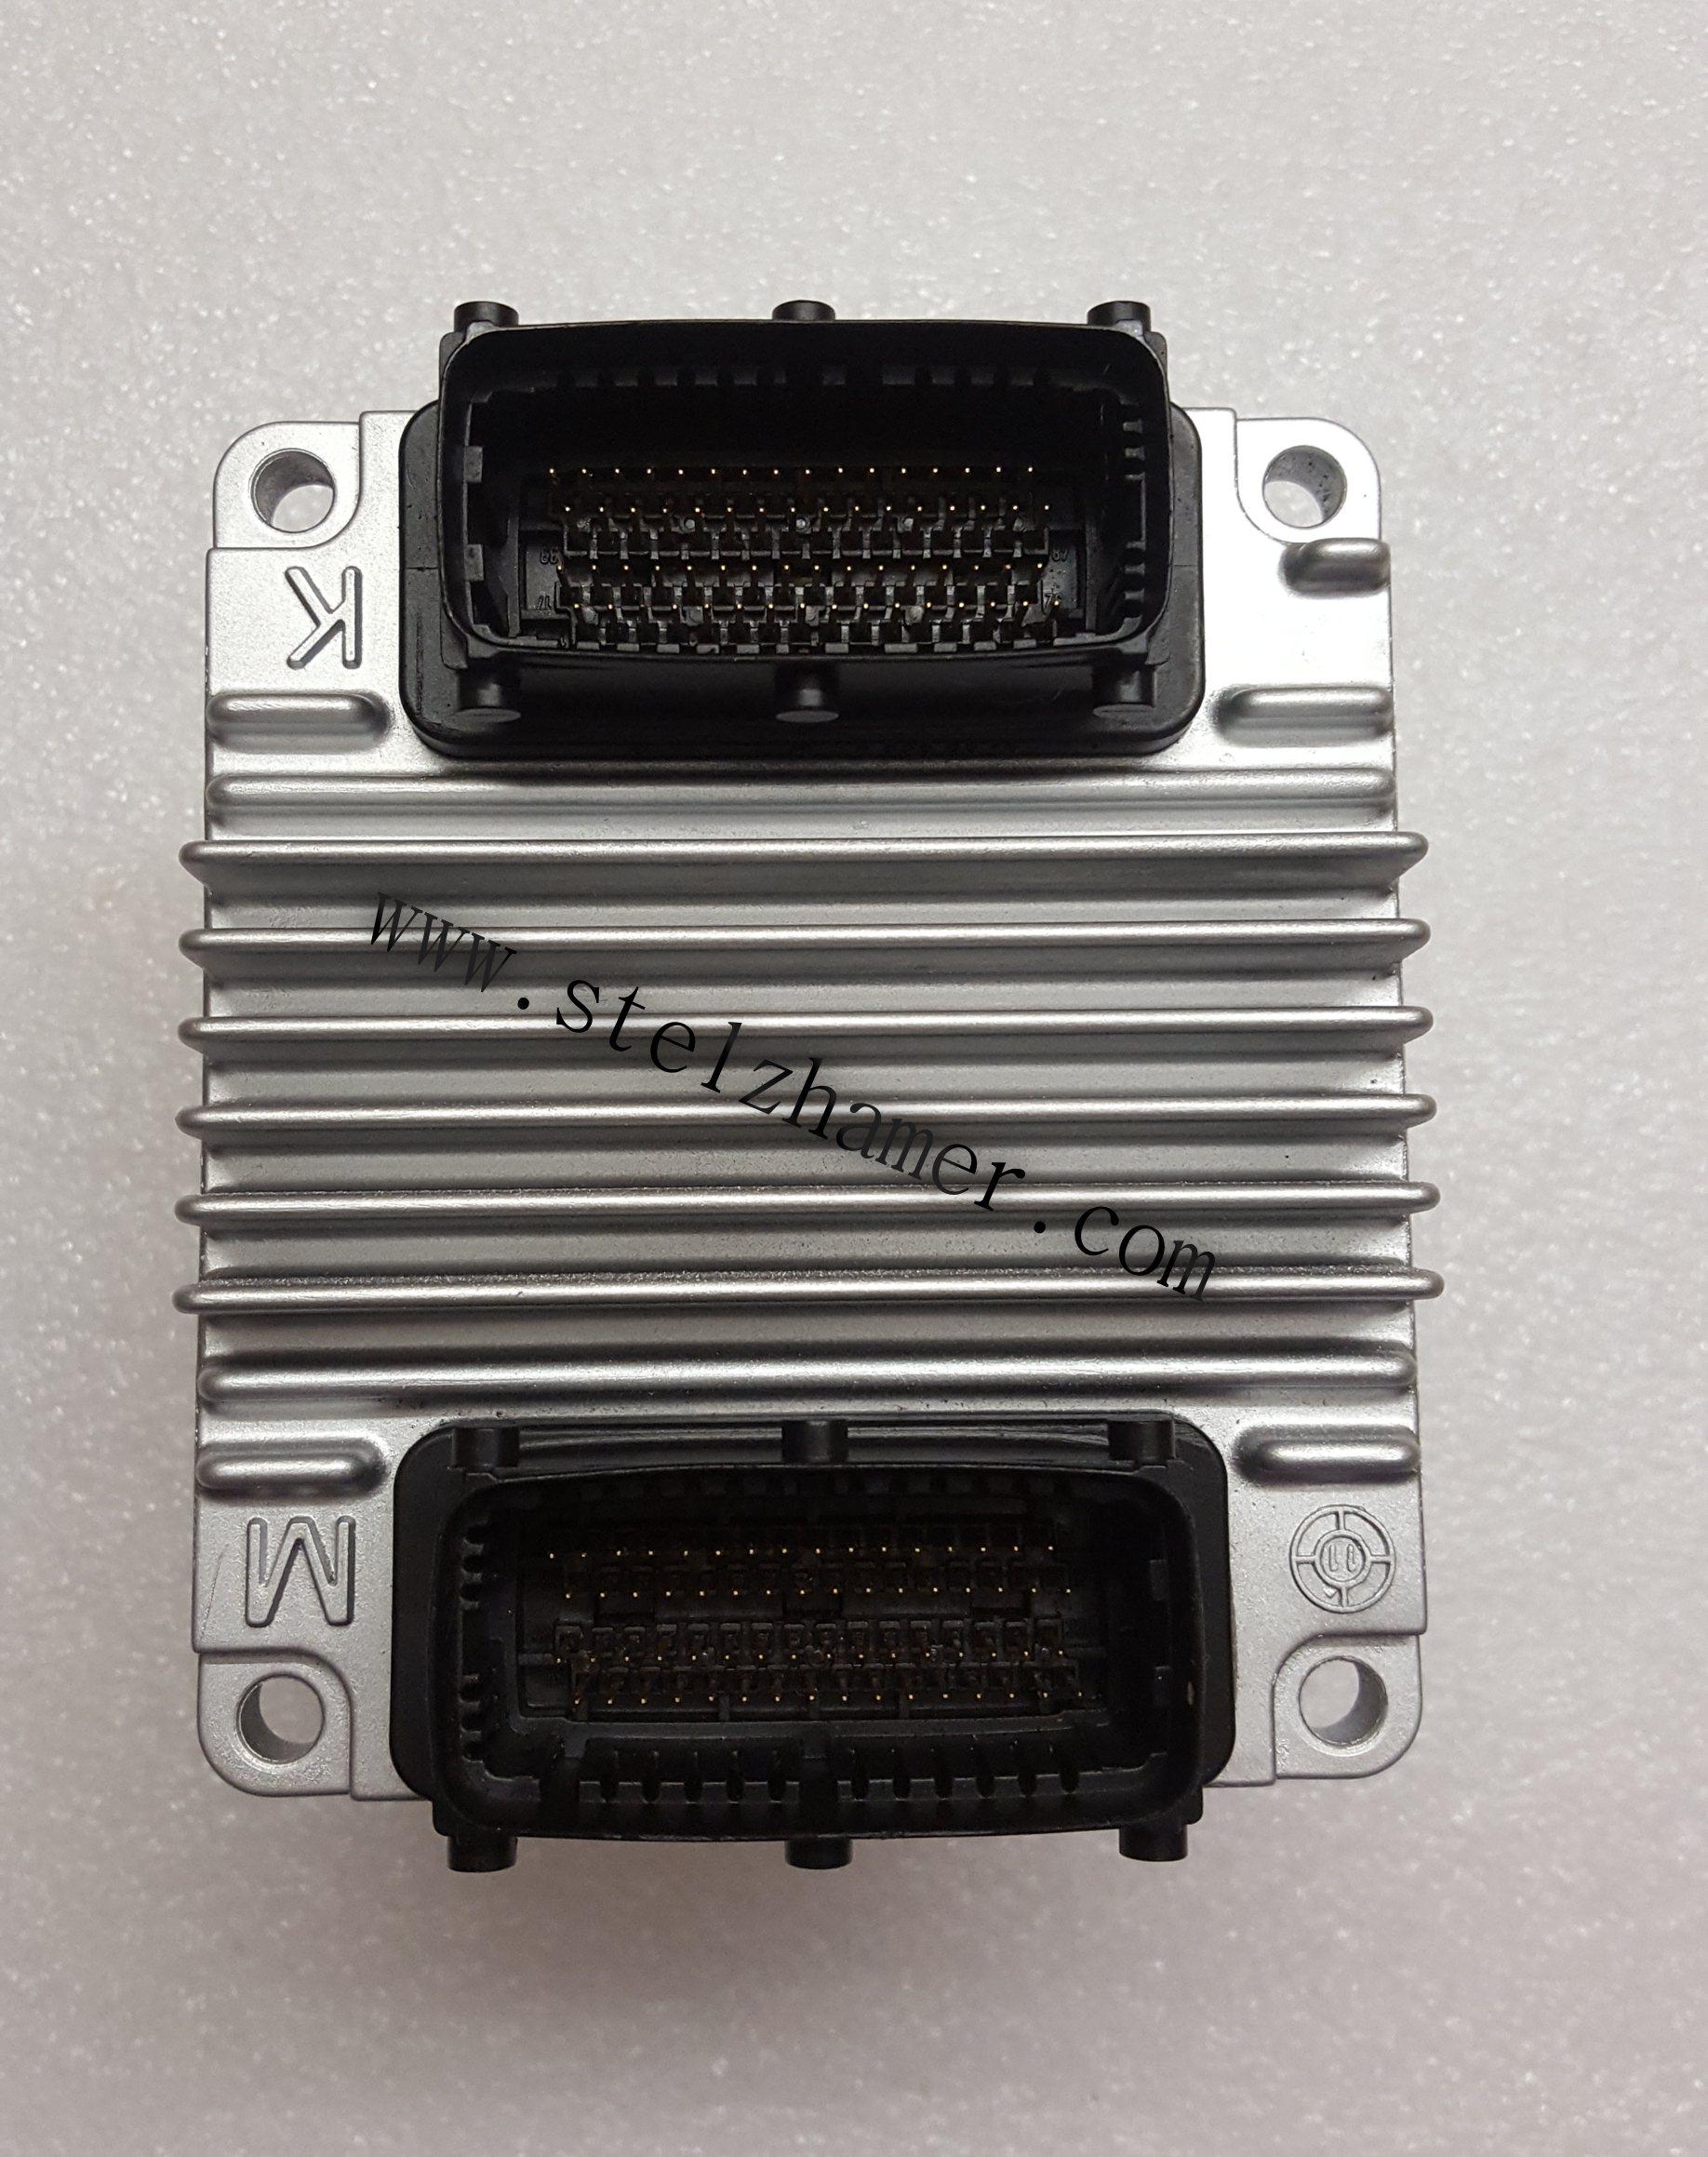 opel motorsteuerger t astra g z16xep hsfi 2 4 opel 6235251. Black Bedroom Furniture Sets. Home Design Ideas